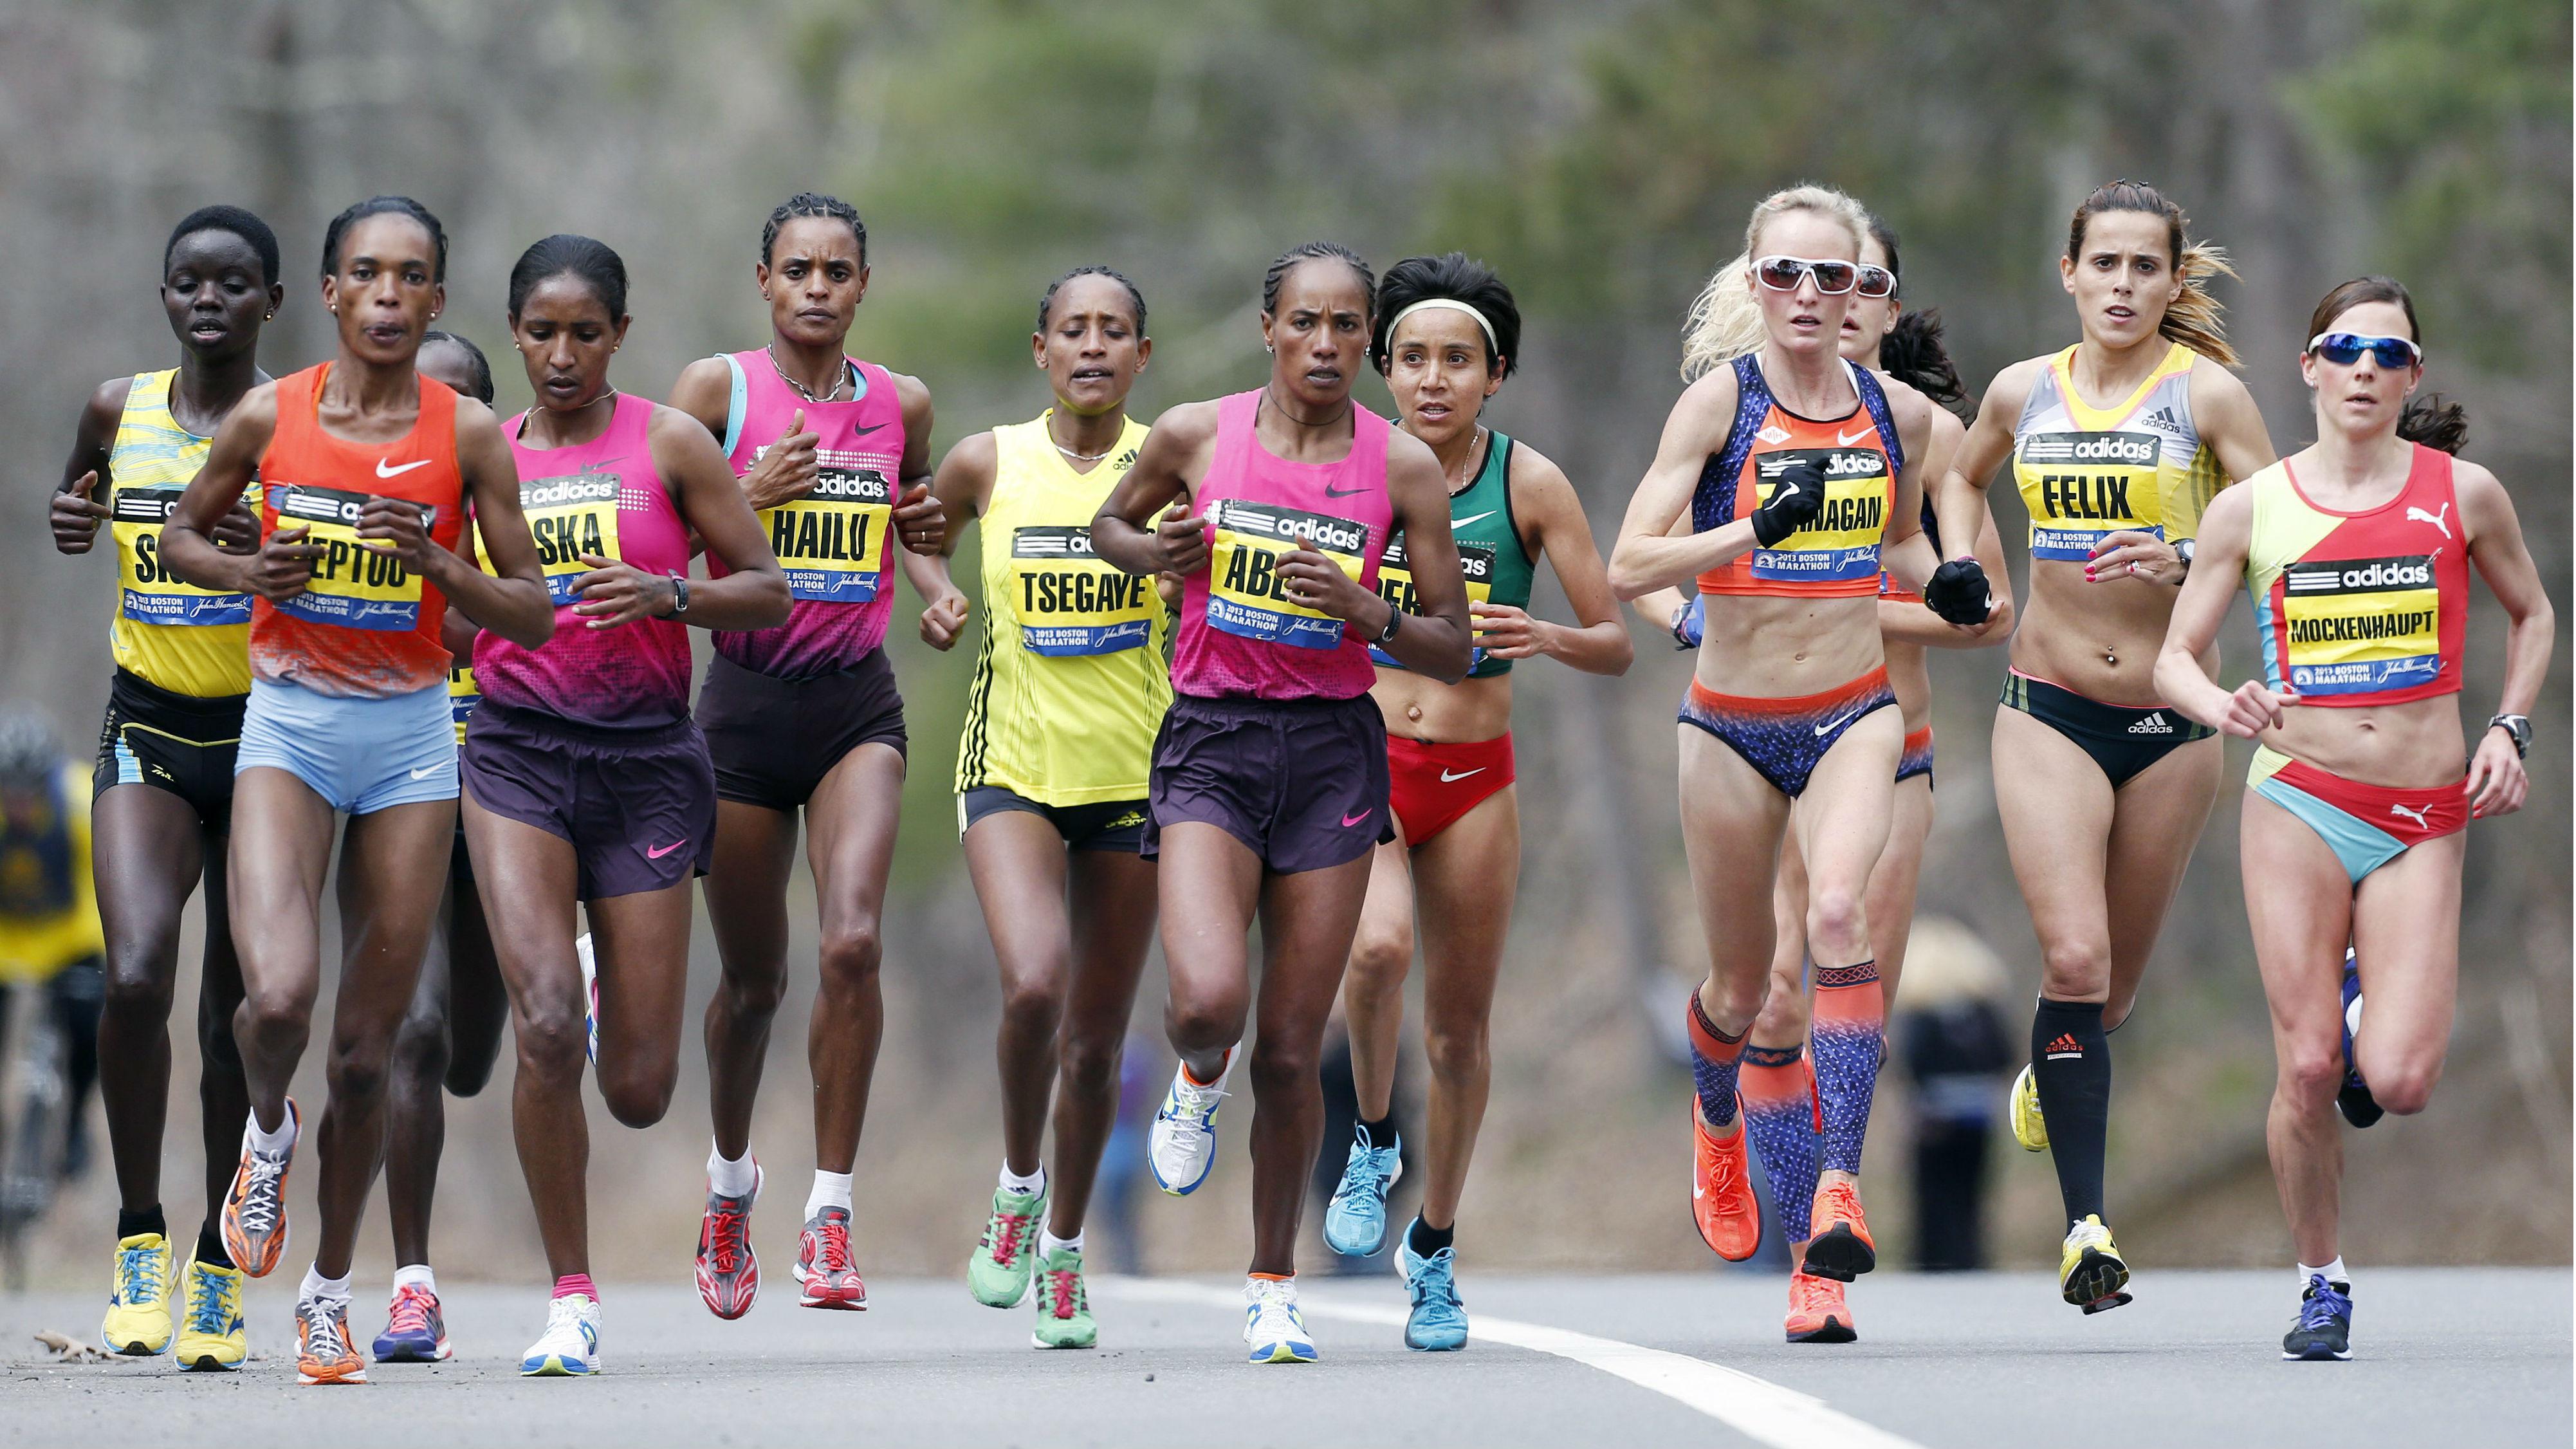 Female marathoners run on a paved road.